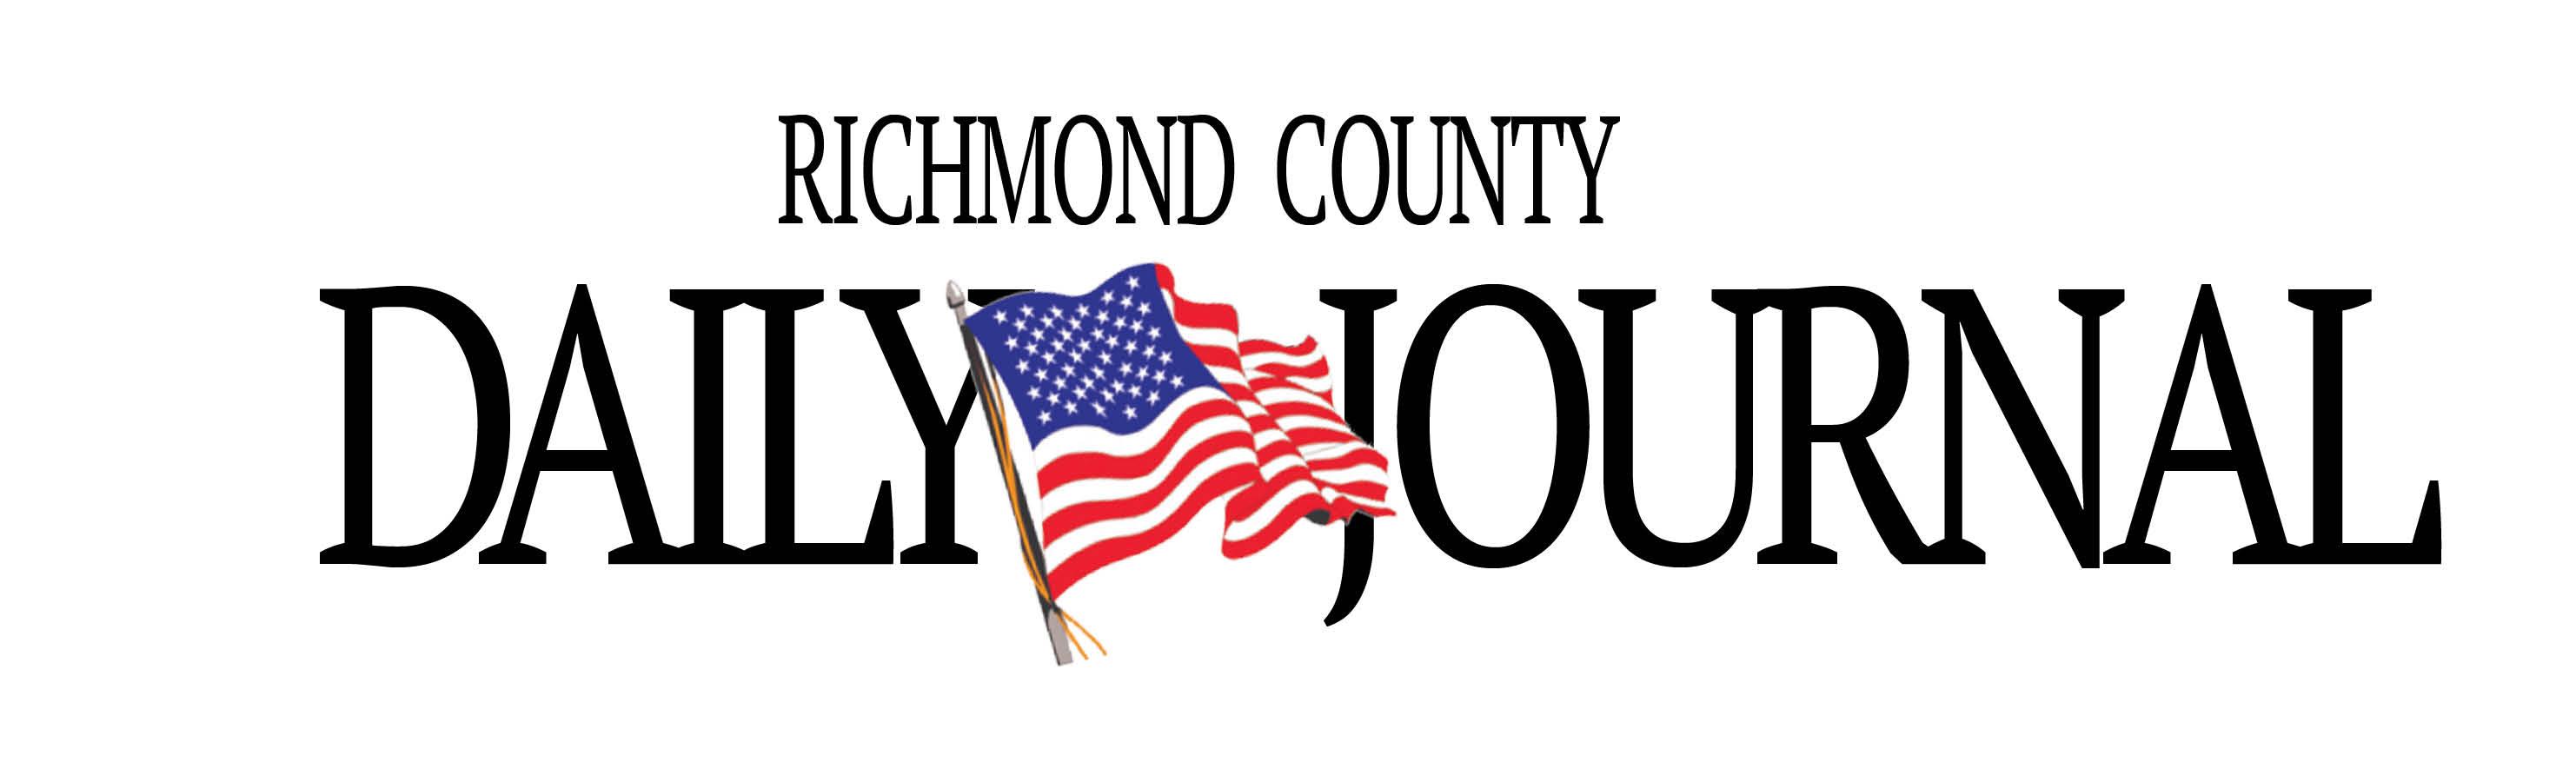 Richmond County Daily Journal 2020